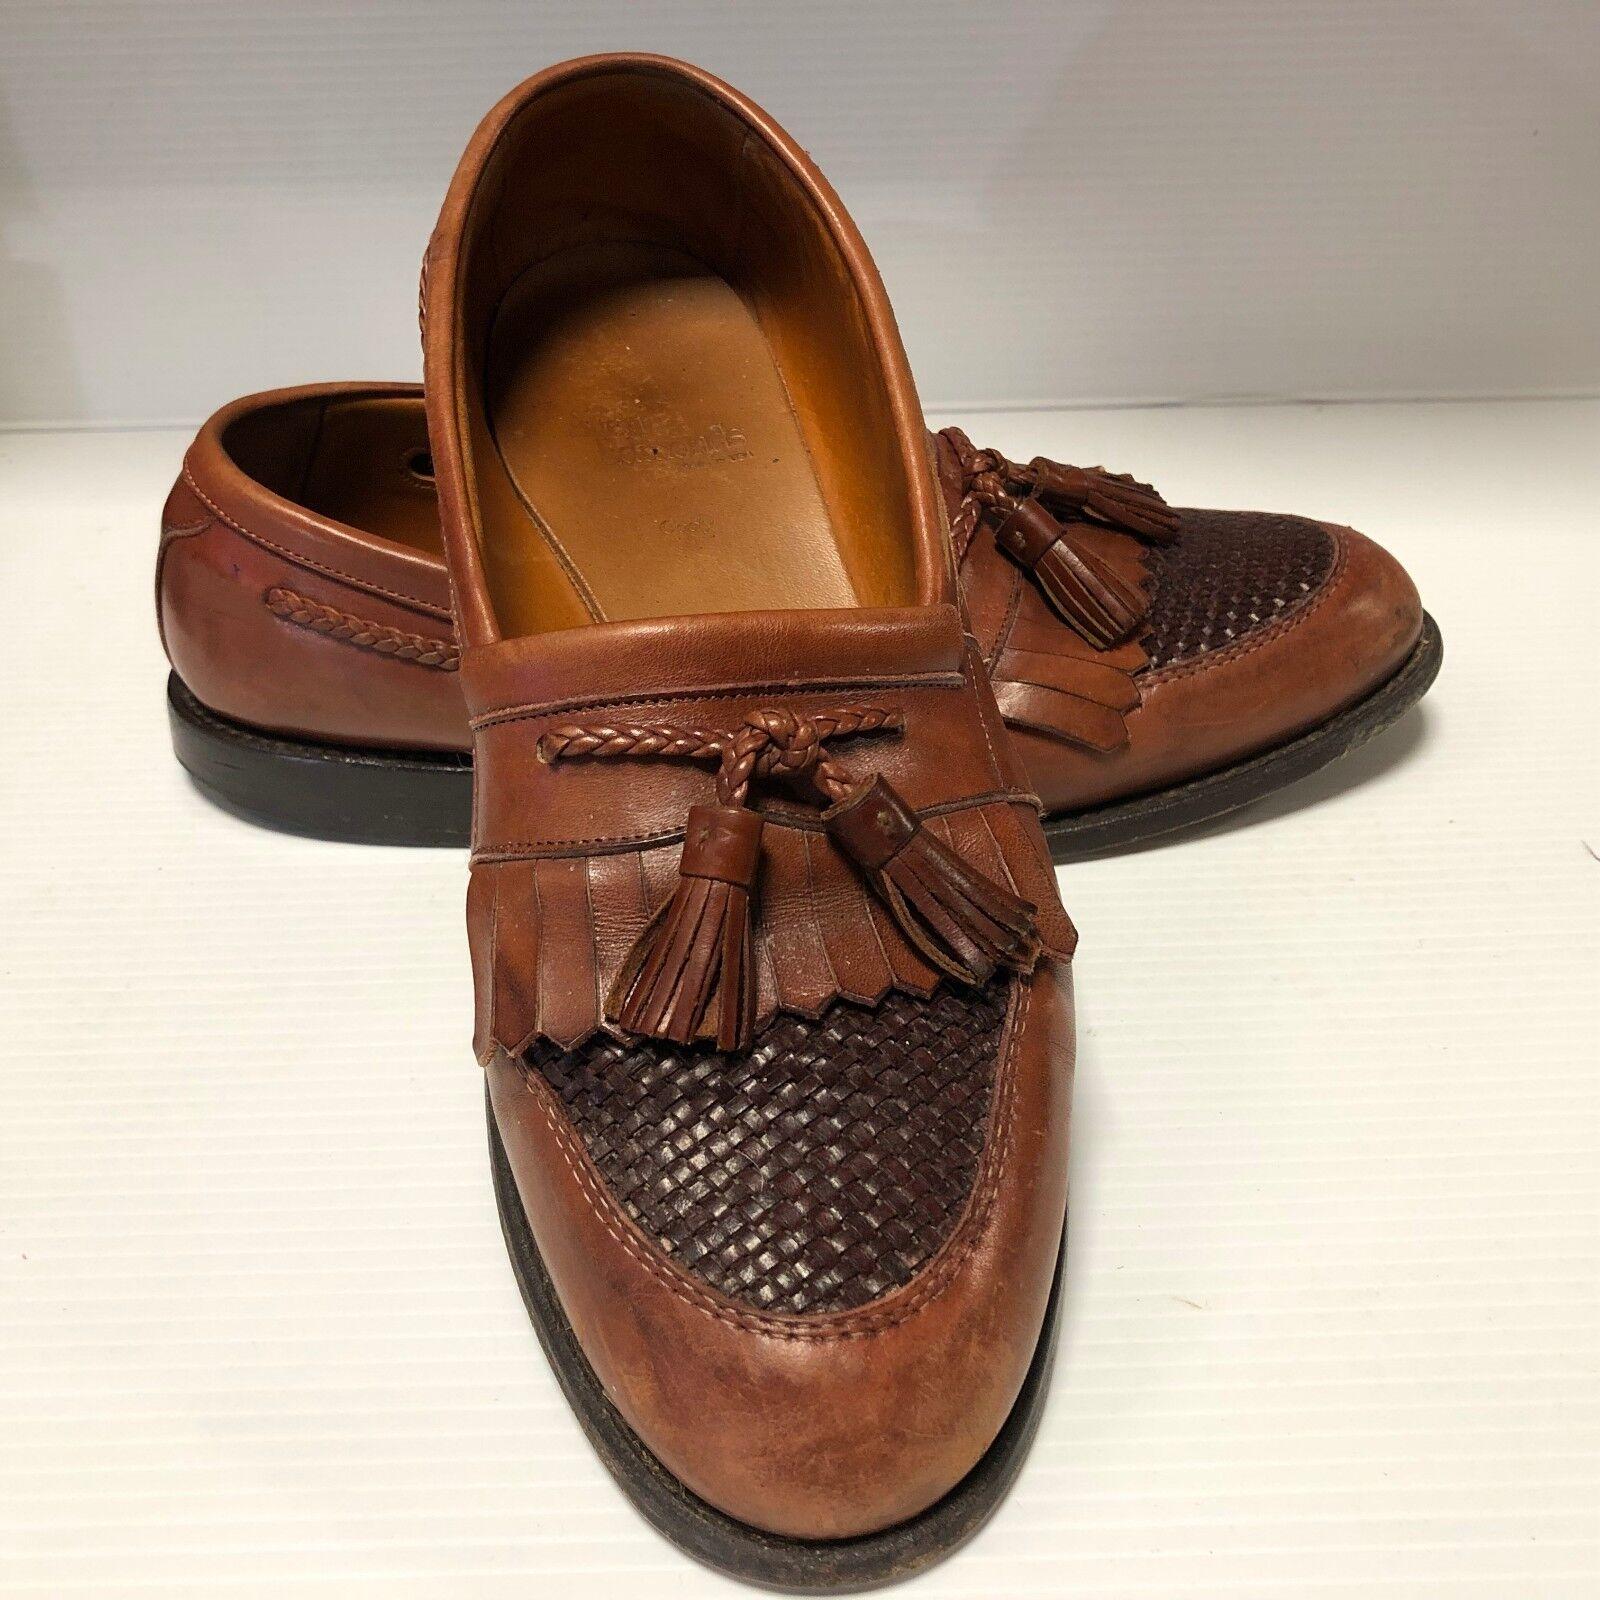 31075 Allen Edmonds Cody Tassel Woven Toe Loafers Men's 11 D Brown